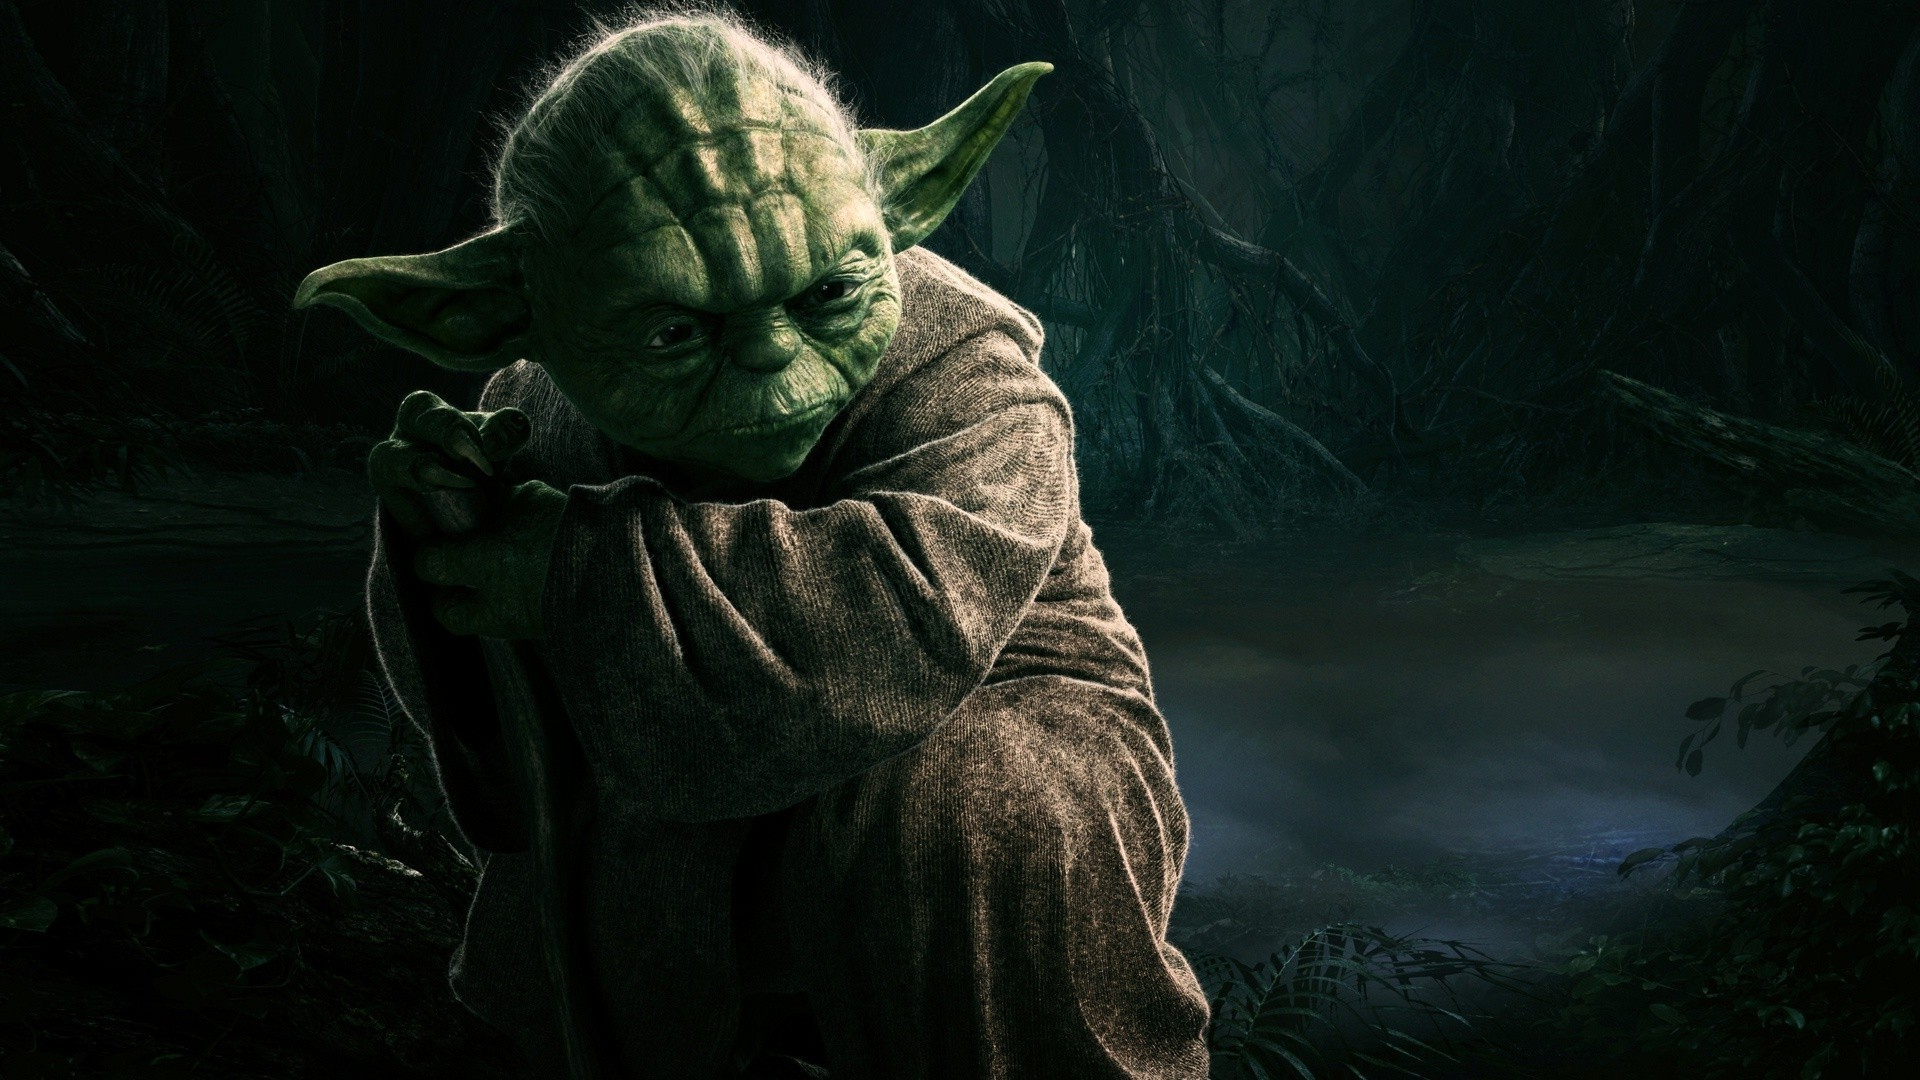 Star Wars Jedi Wallpapers High Quality As Wallpaper HD